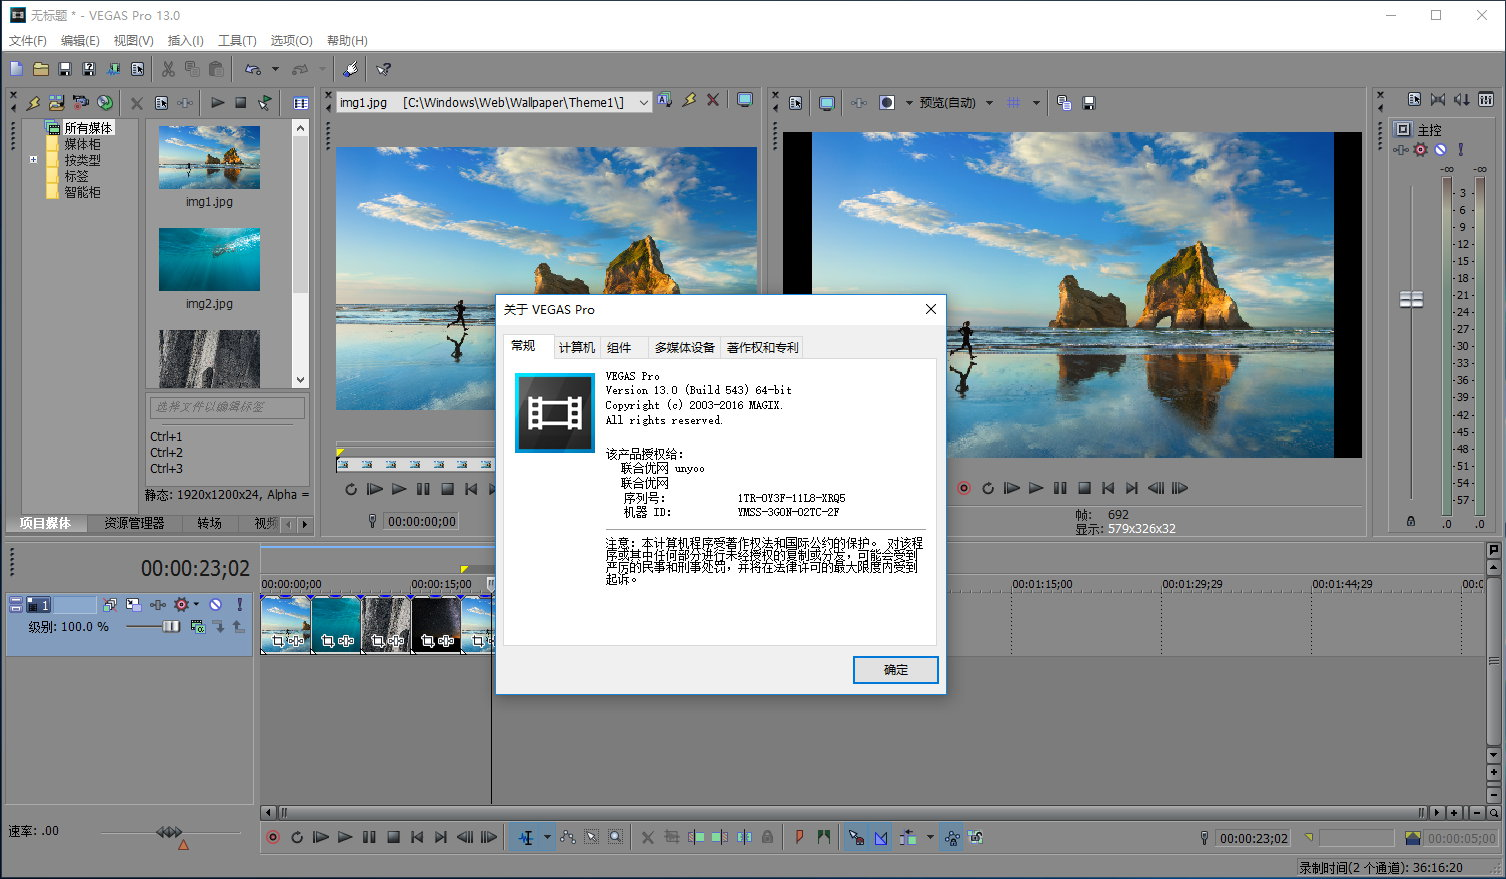 MAGIX Vegas Pro 13.0 Build 543 x64多语言中文注册版